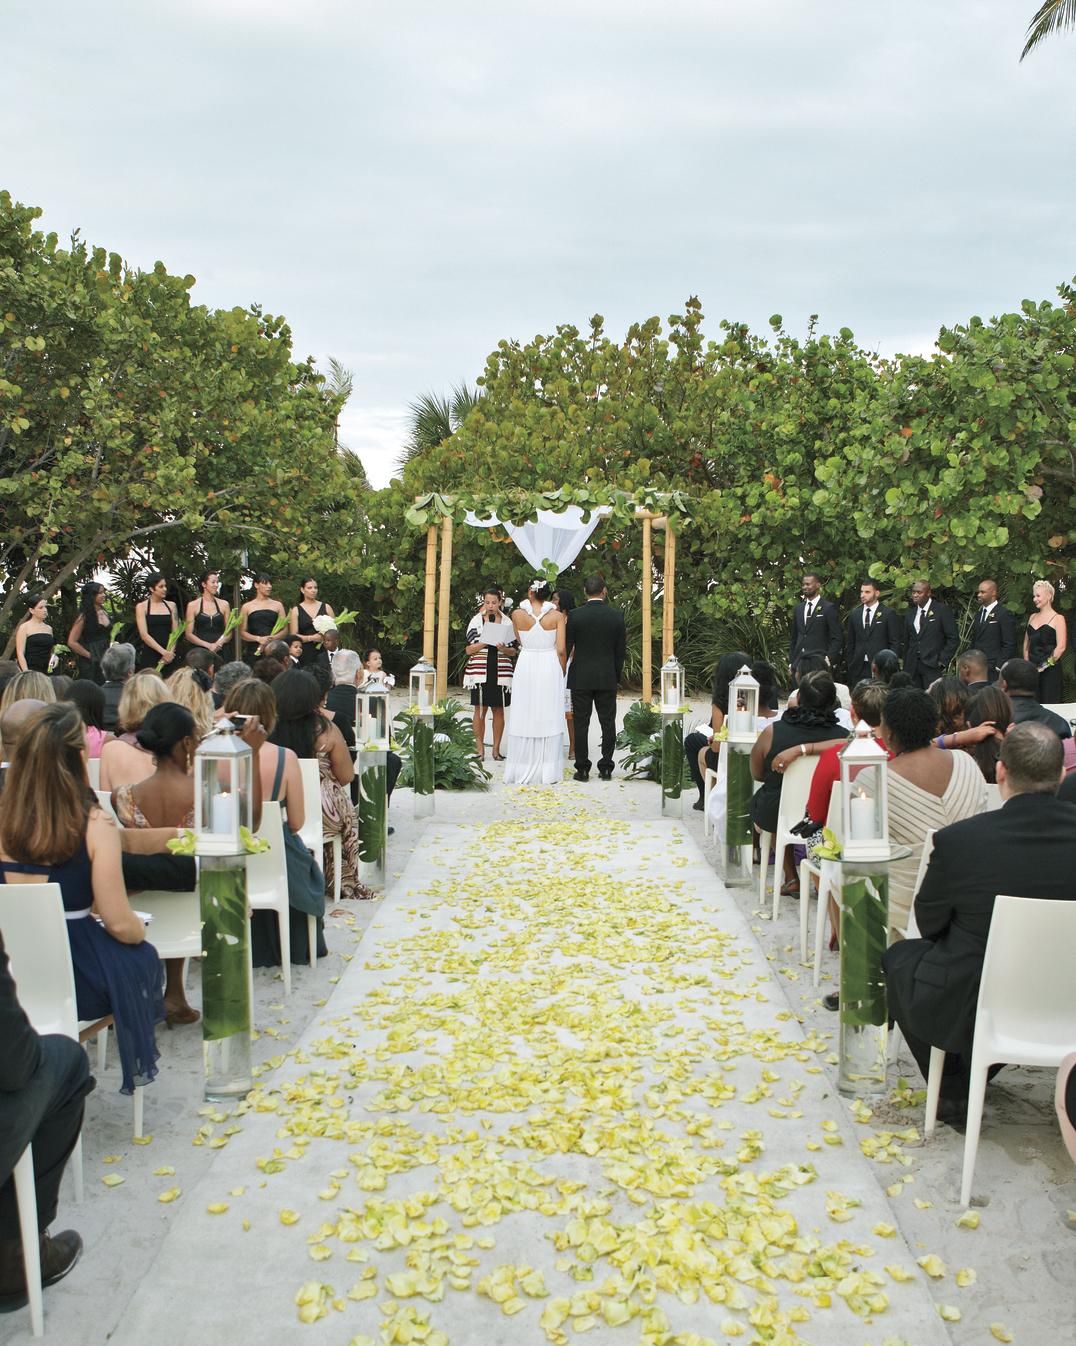 gracia-dan-ceremony-1846-mwd107271.jpg